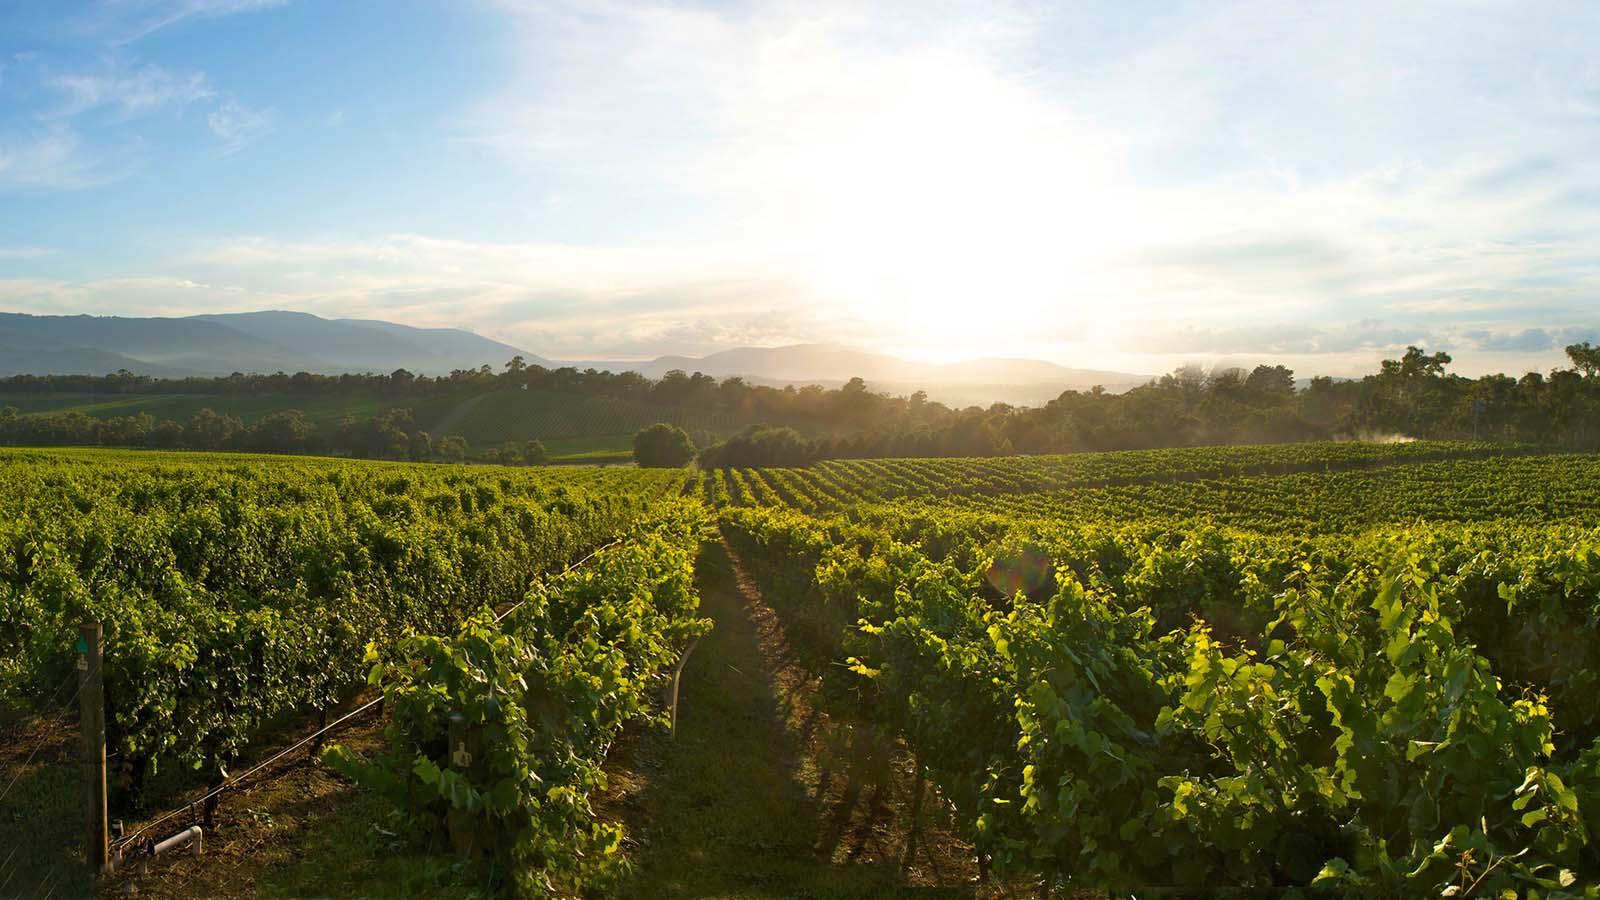 Killara Estate Winery, Yarra Valley and Dandenong Ranges, Victoria, Australia